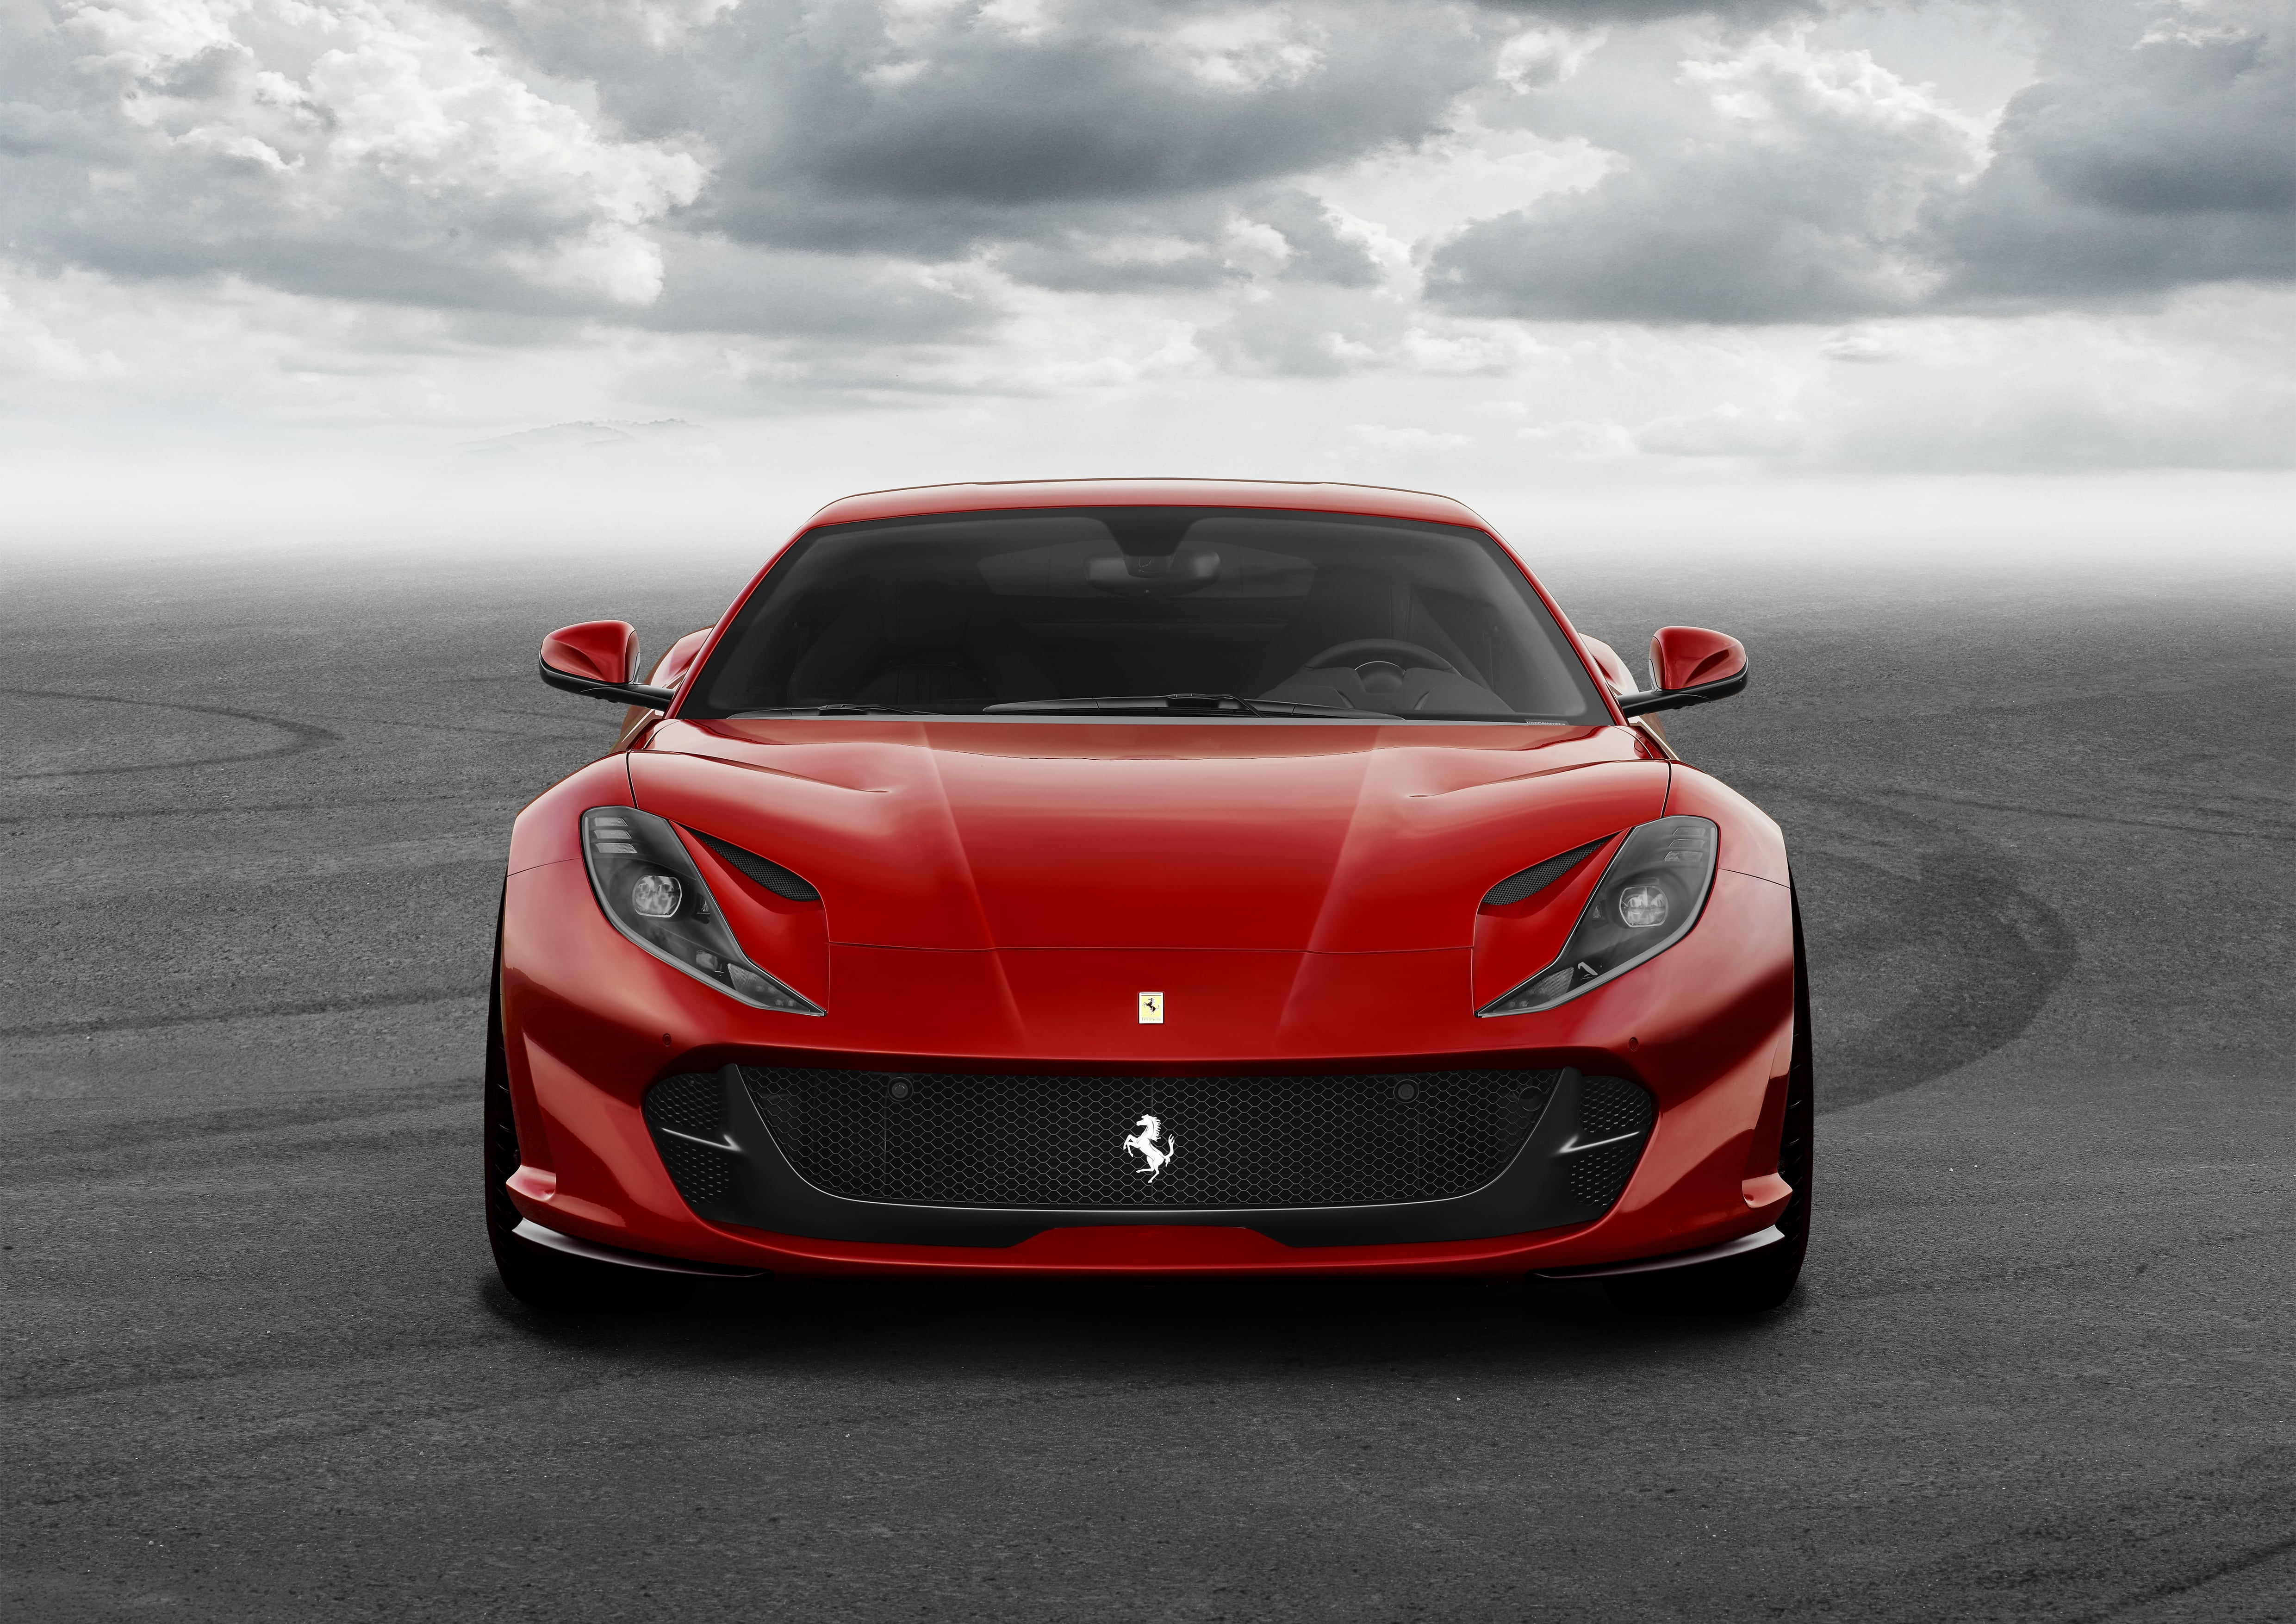 Ferrari 812 Superfast caratteristiche scheda tecnica